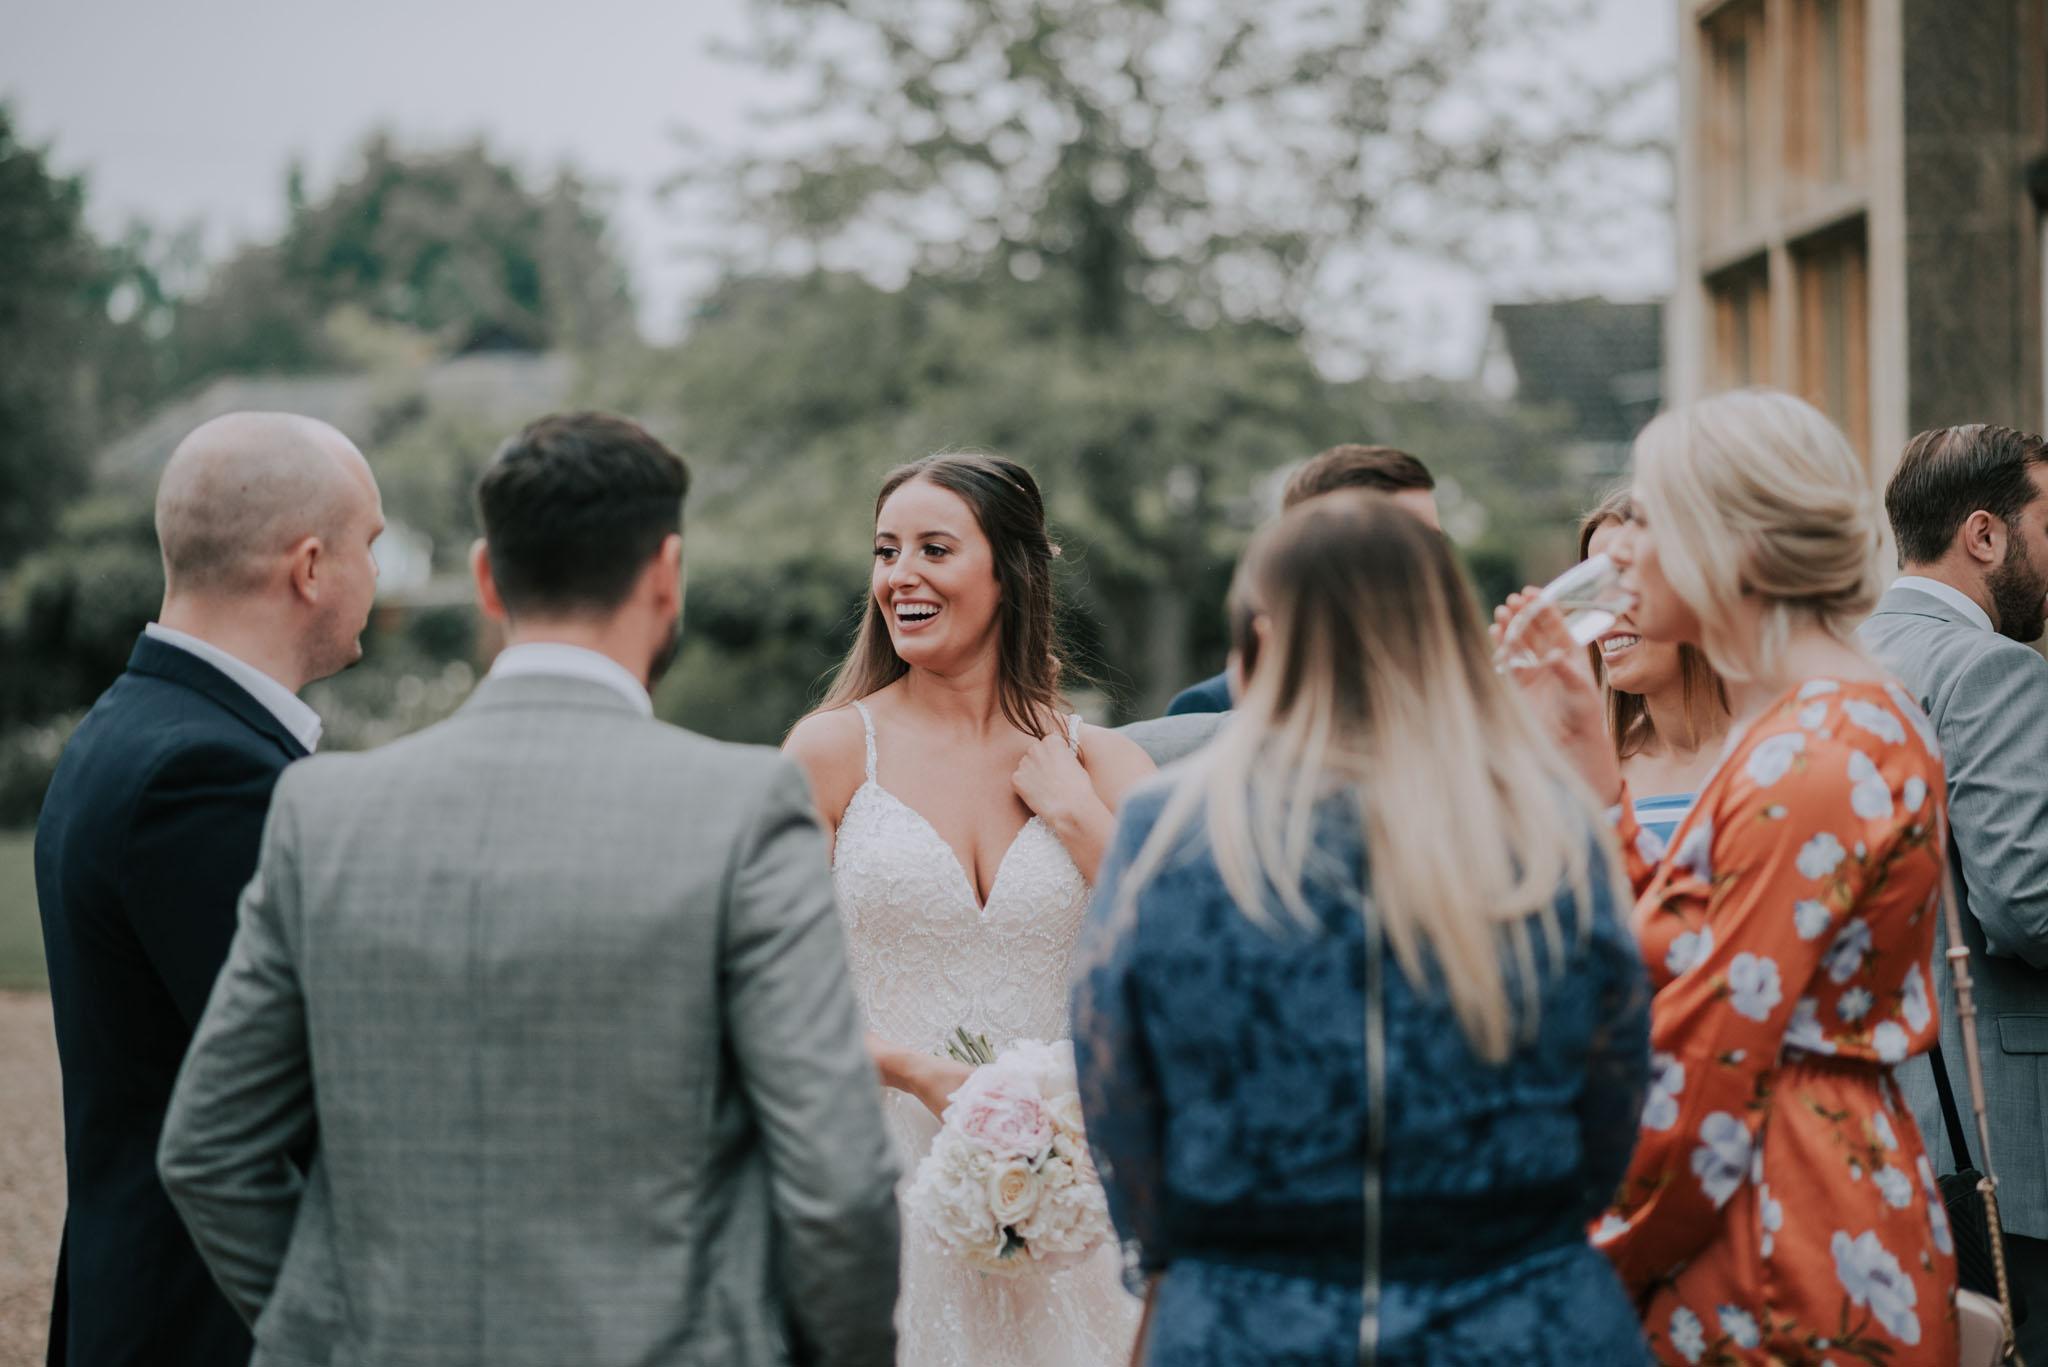 wedding-photographer-glewstone-court-hereford-scott-stockwell-photography361.jpg